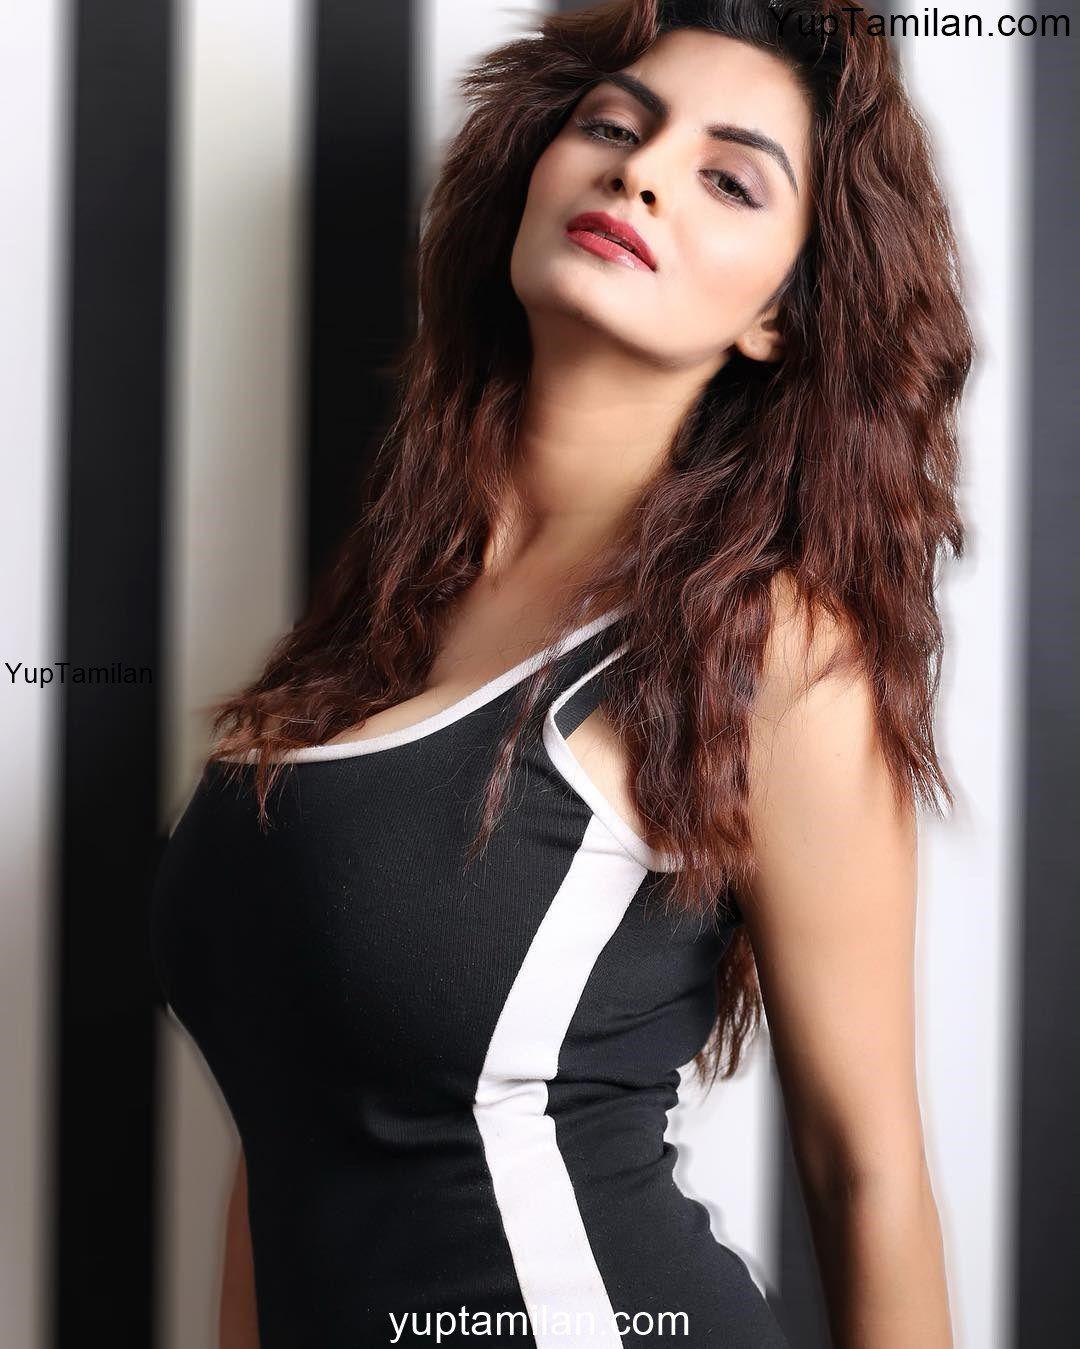 Anveshi Jain Sexy Bikini, Sports Bra Images in HD